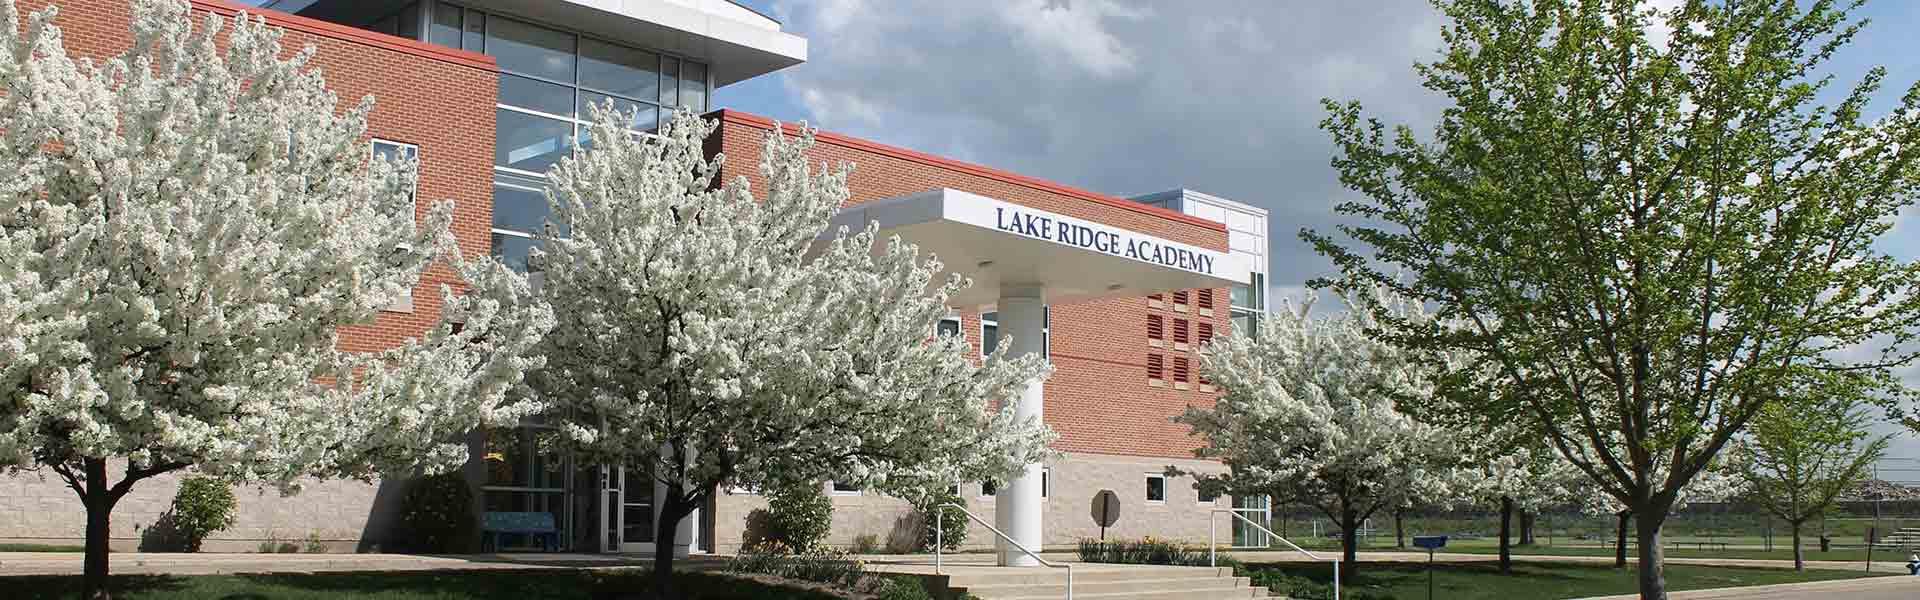 Lake Ridge Academy campus picture